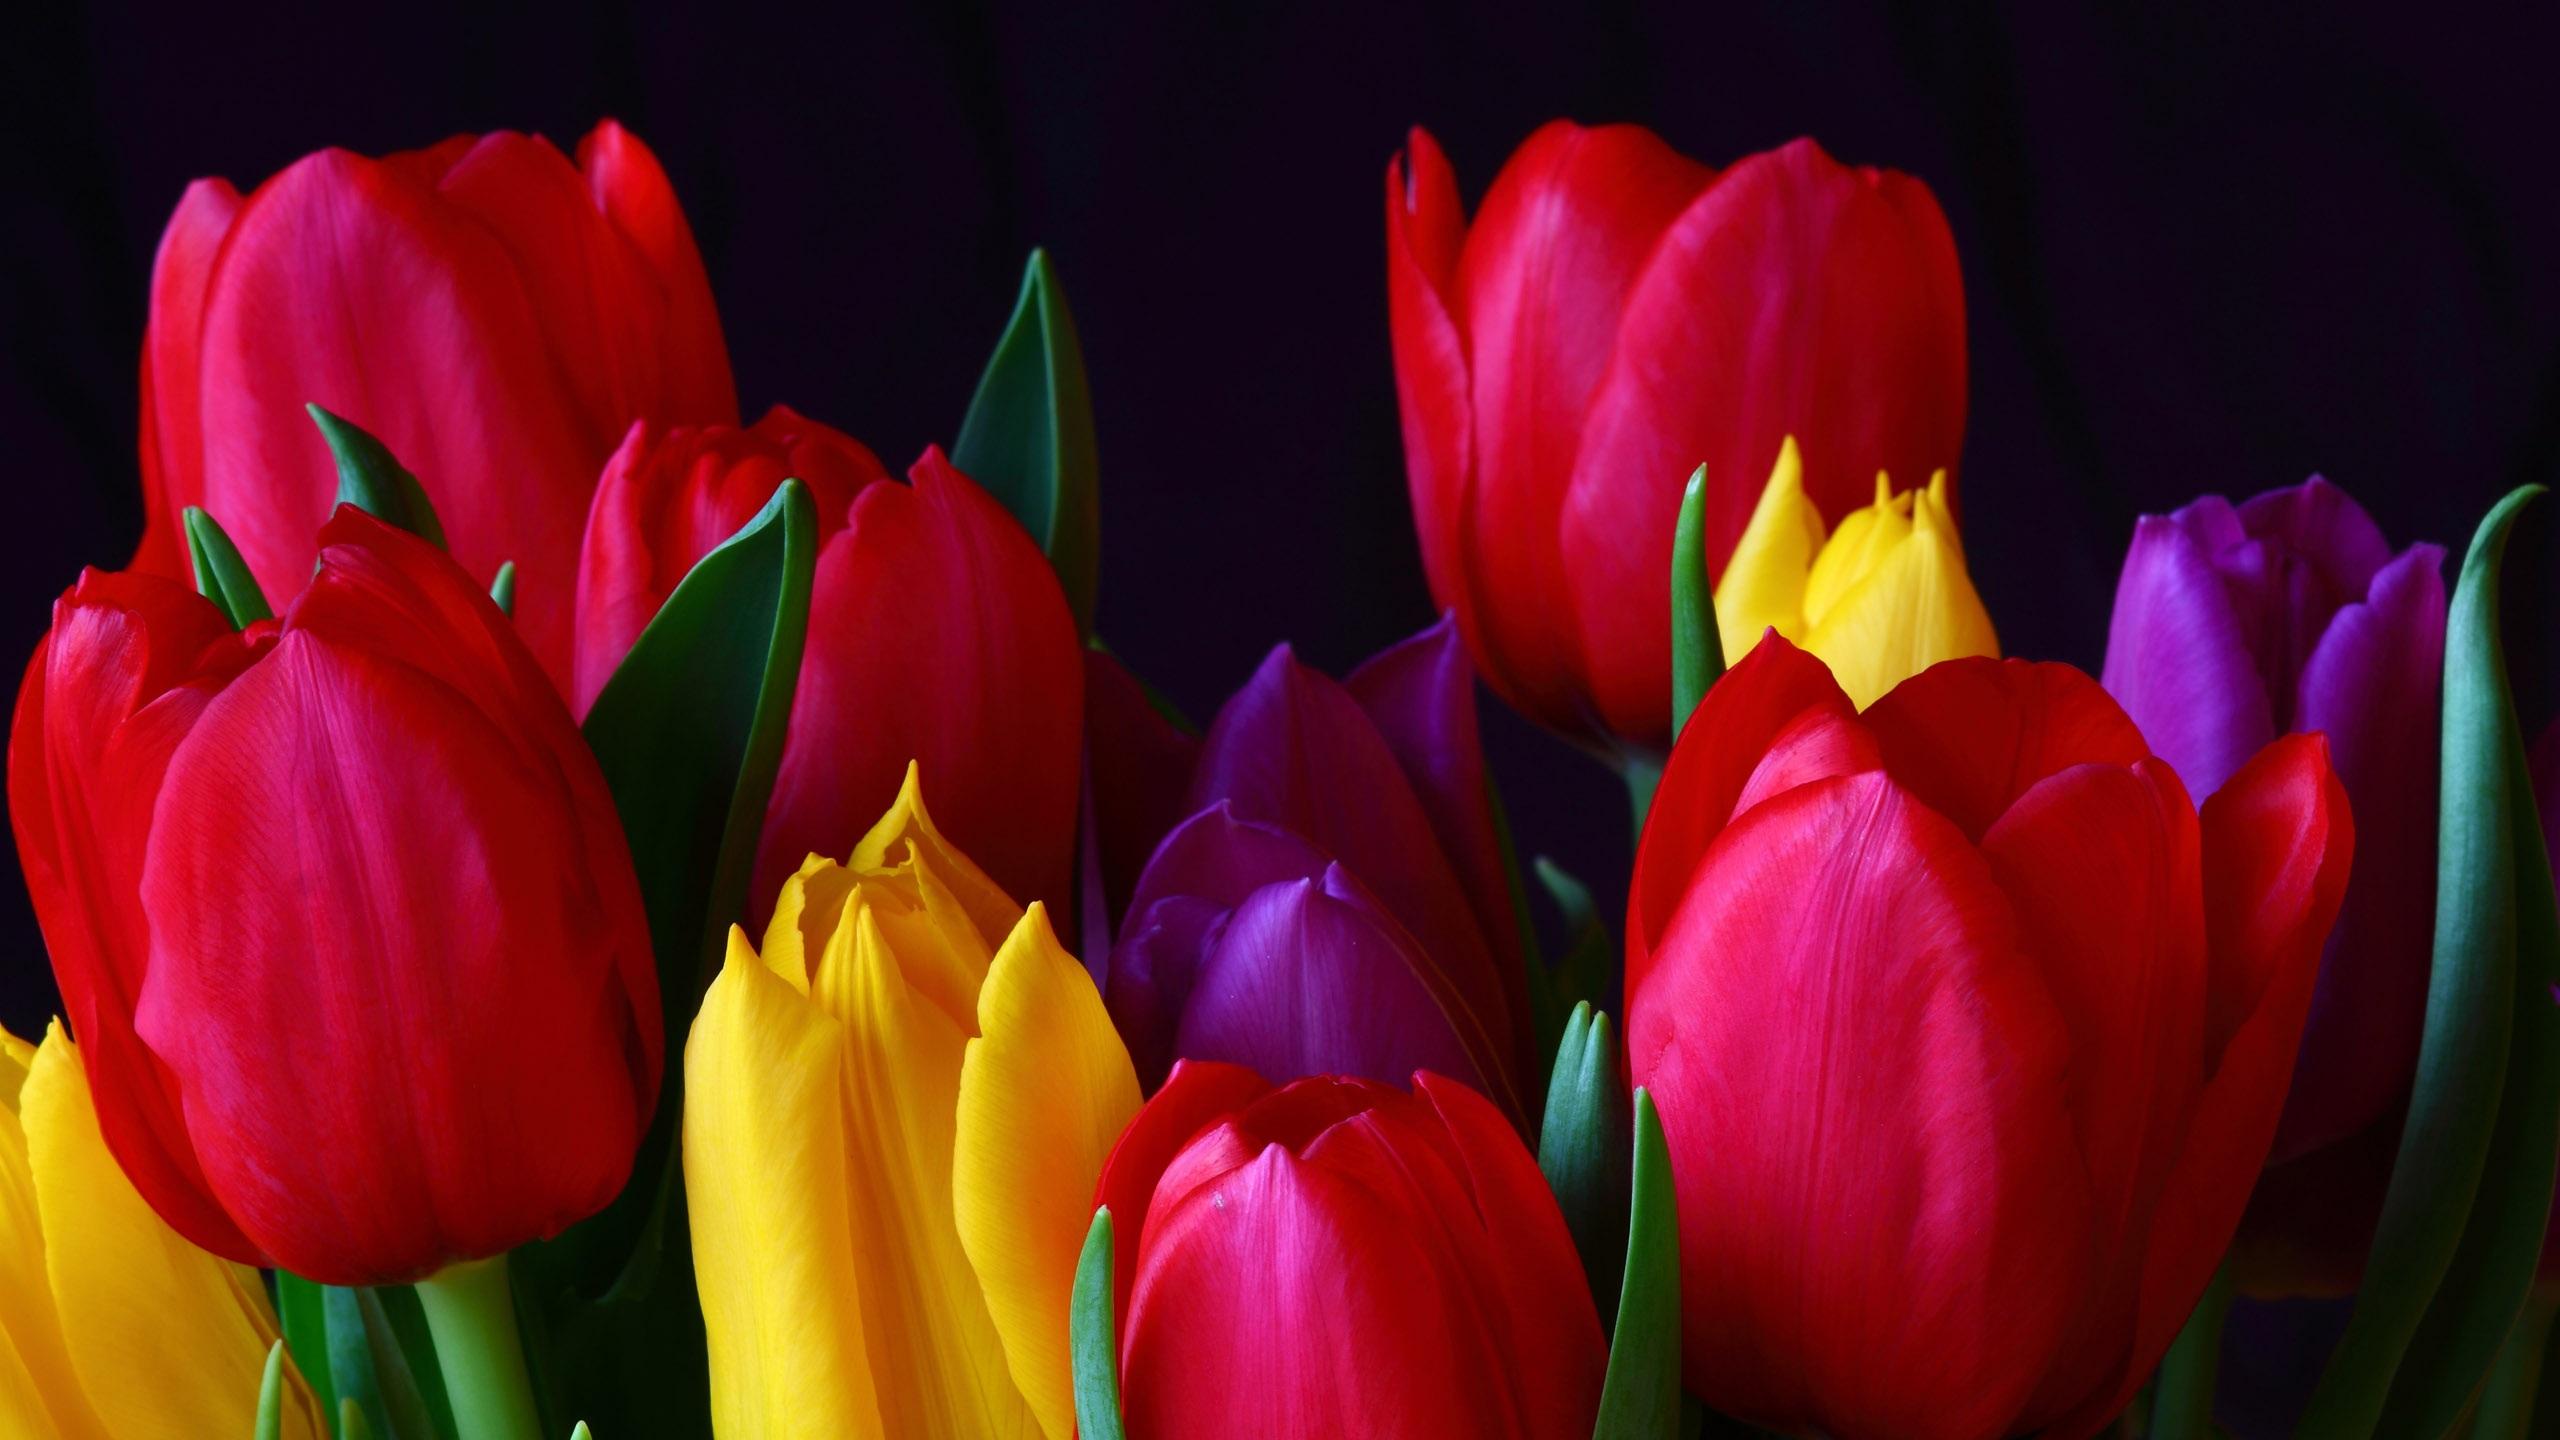 Fonds D Ecran Tulip 2560x1600 Hd Image